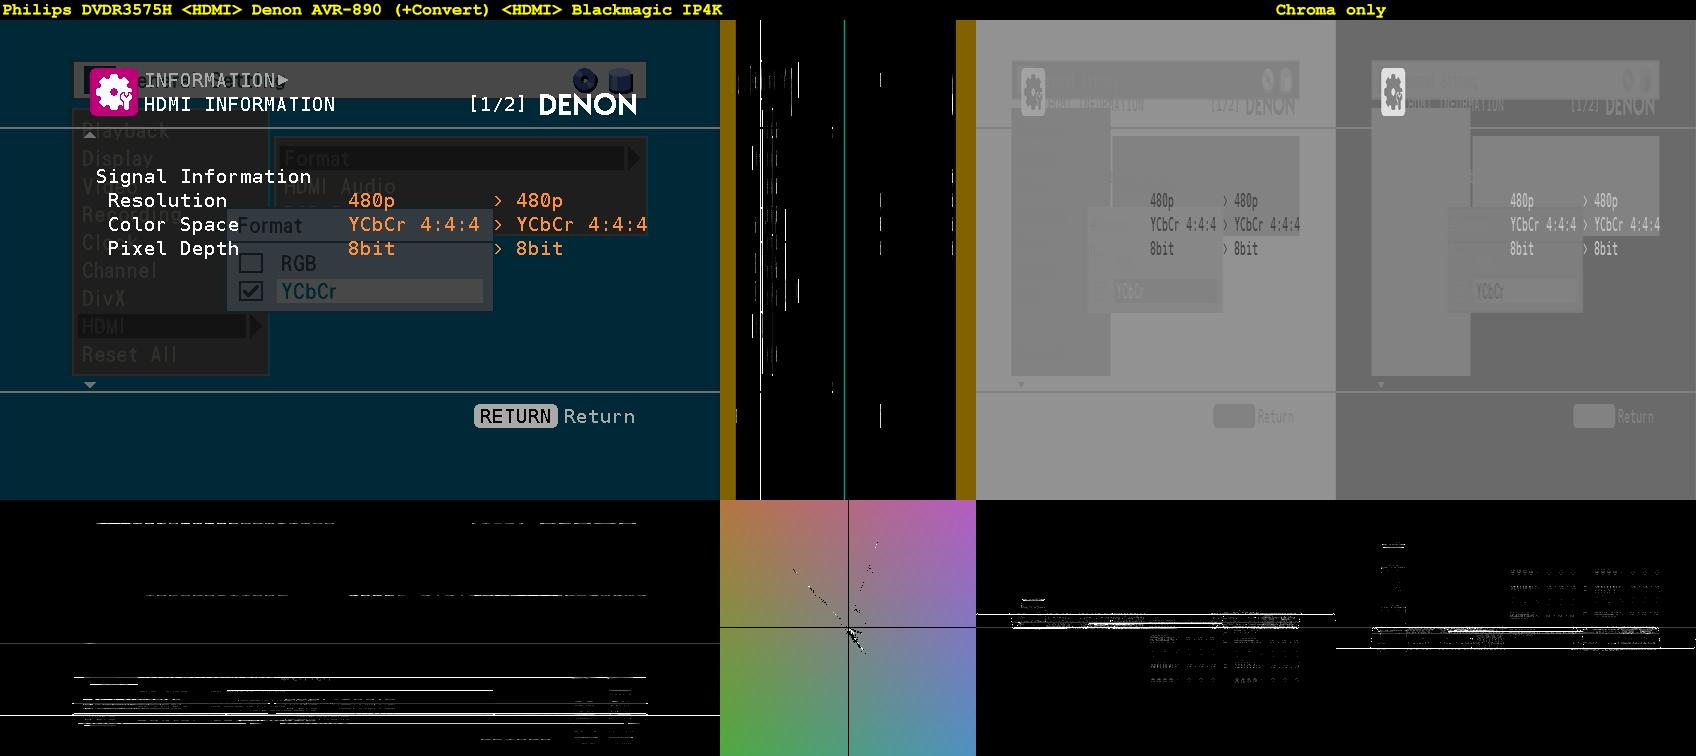 Click image for larger version  Name:Menu + Info - Philips DVDR3575H =HDMI= Denon AVR-890 (+Convert) =HDMI= Blackmagic IP4K.png Views:2329 Size:85.5 KB ID:37601